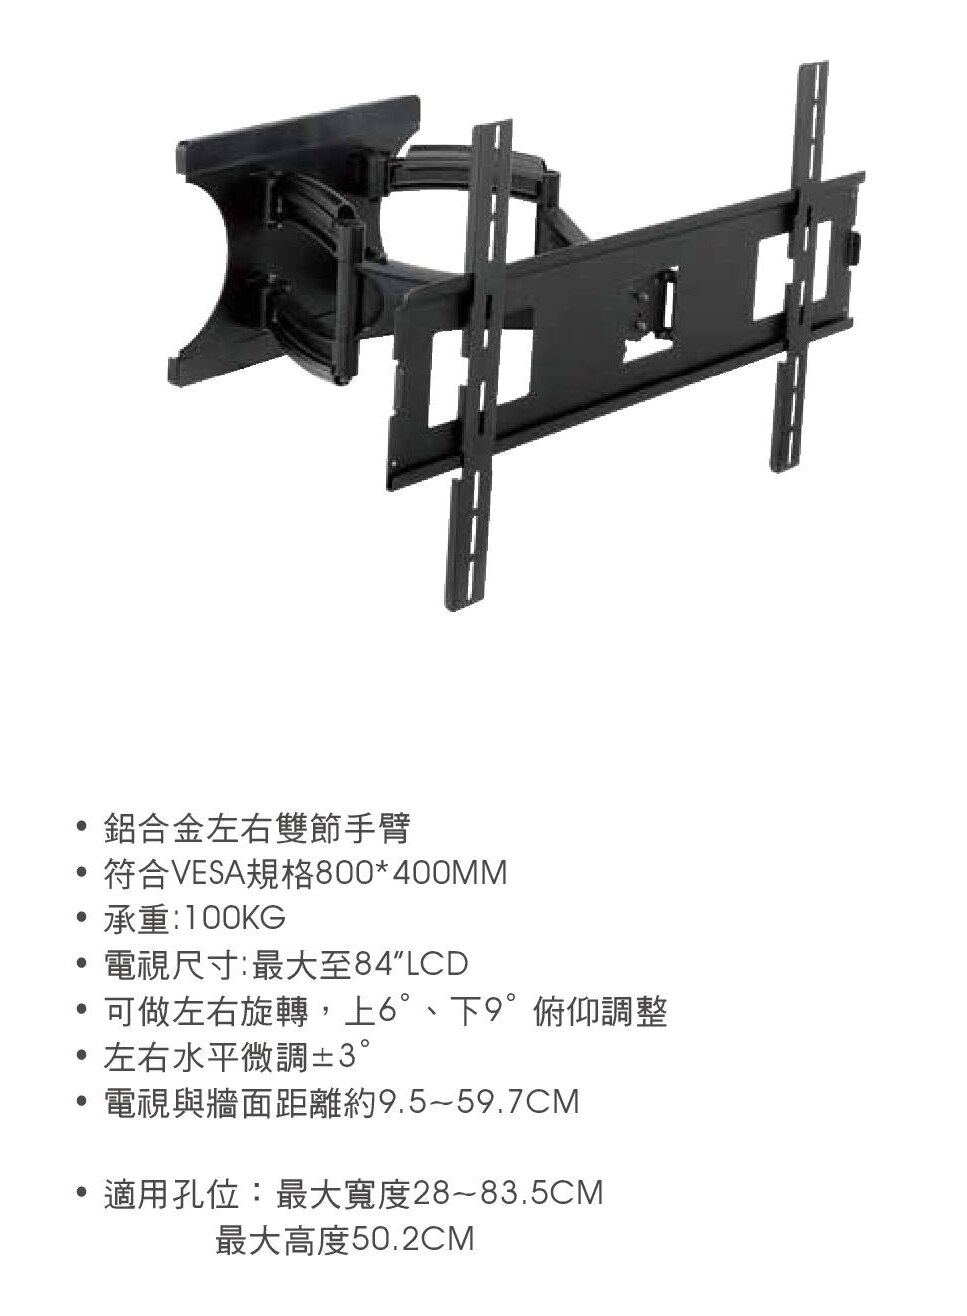 AviewS-CMW-277/鋁合金液晶壁掛架/台灣製造 1